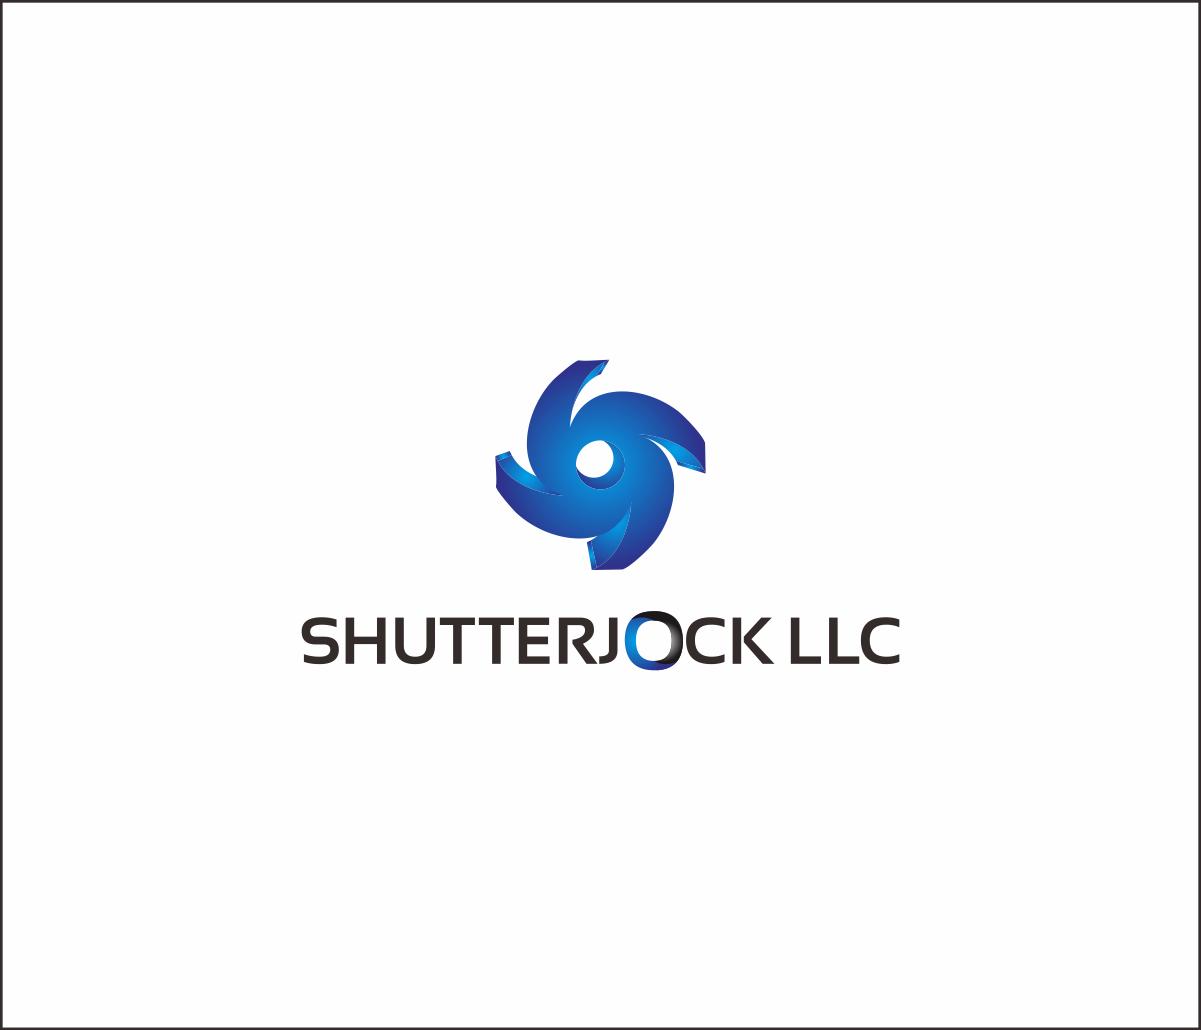 Logo Design by Armada Jamaluddin - Entry No. 68 in the Logo Design Contest Unique Logo Design Wanted for Shutterjock LLC.